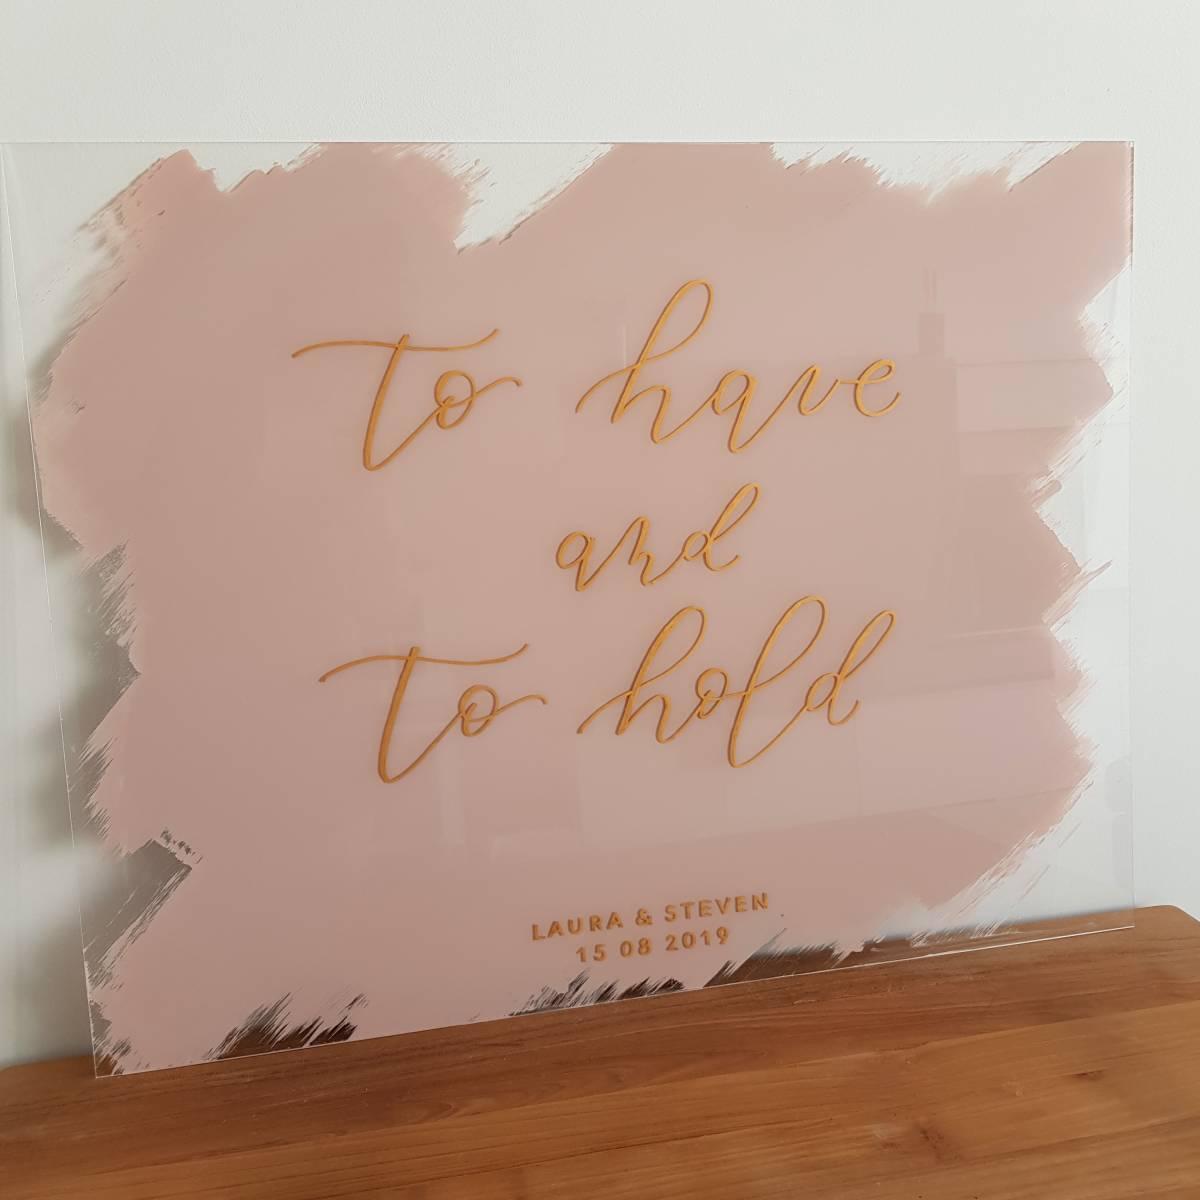 Touch of Gold - Trouwuitnodiging - Huwelijksuitnodiging - Kalligrafie - House of Weddings - 4